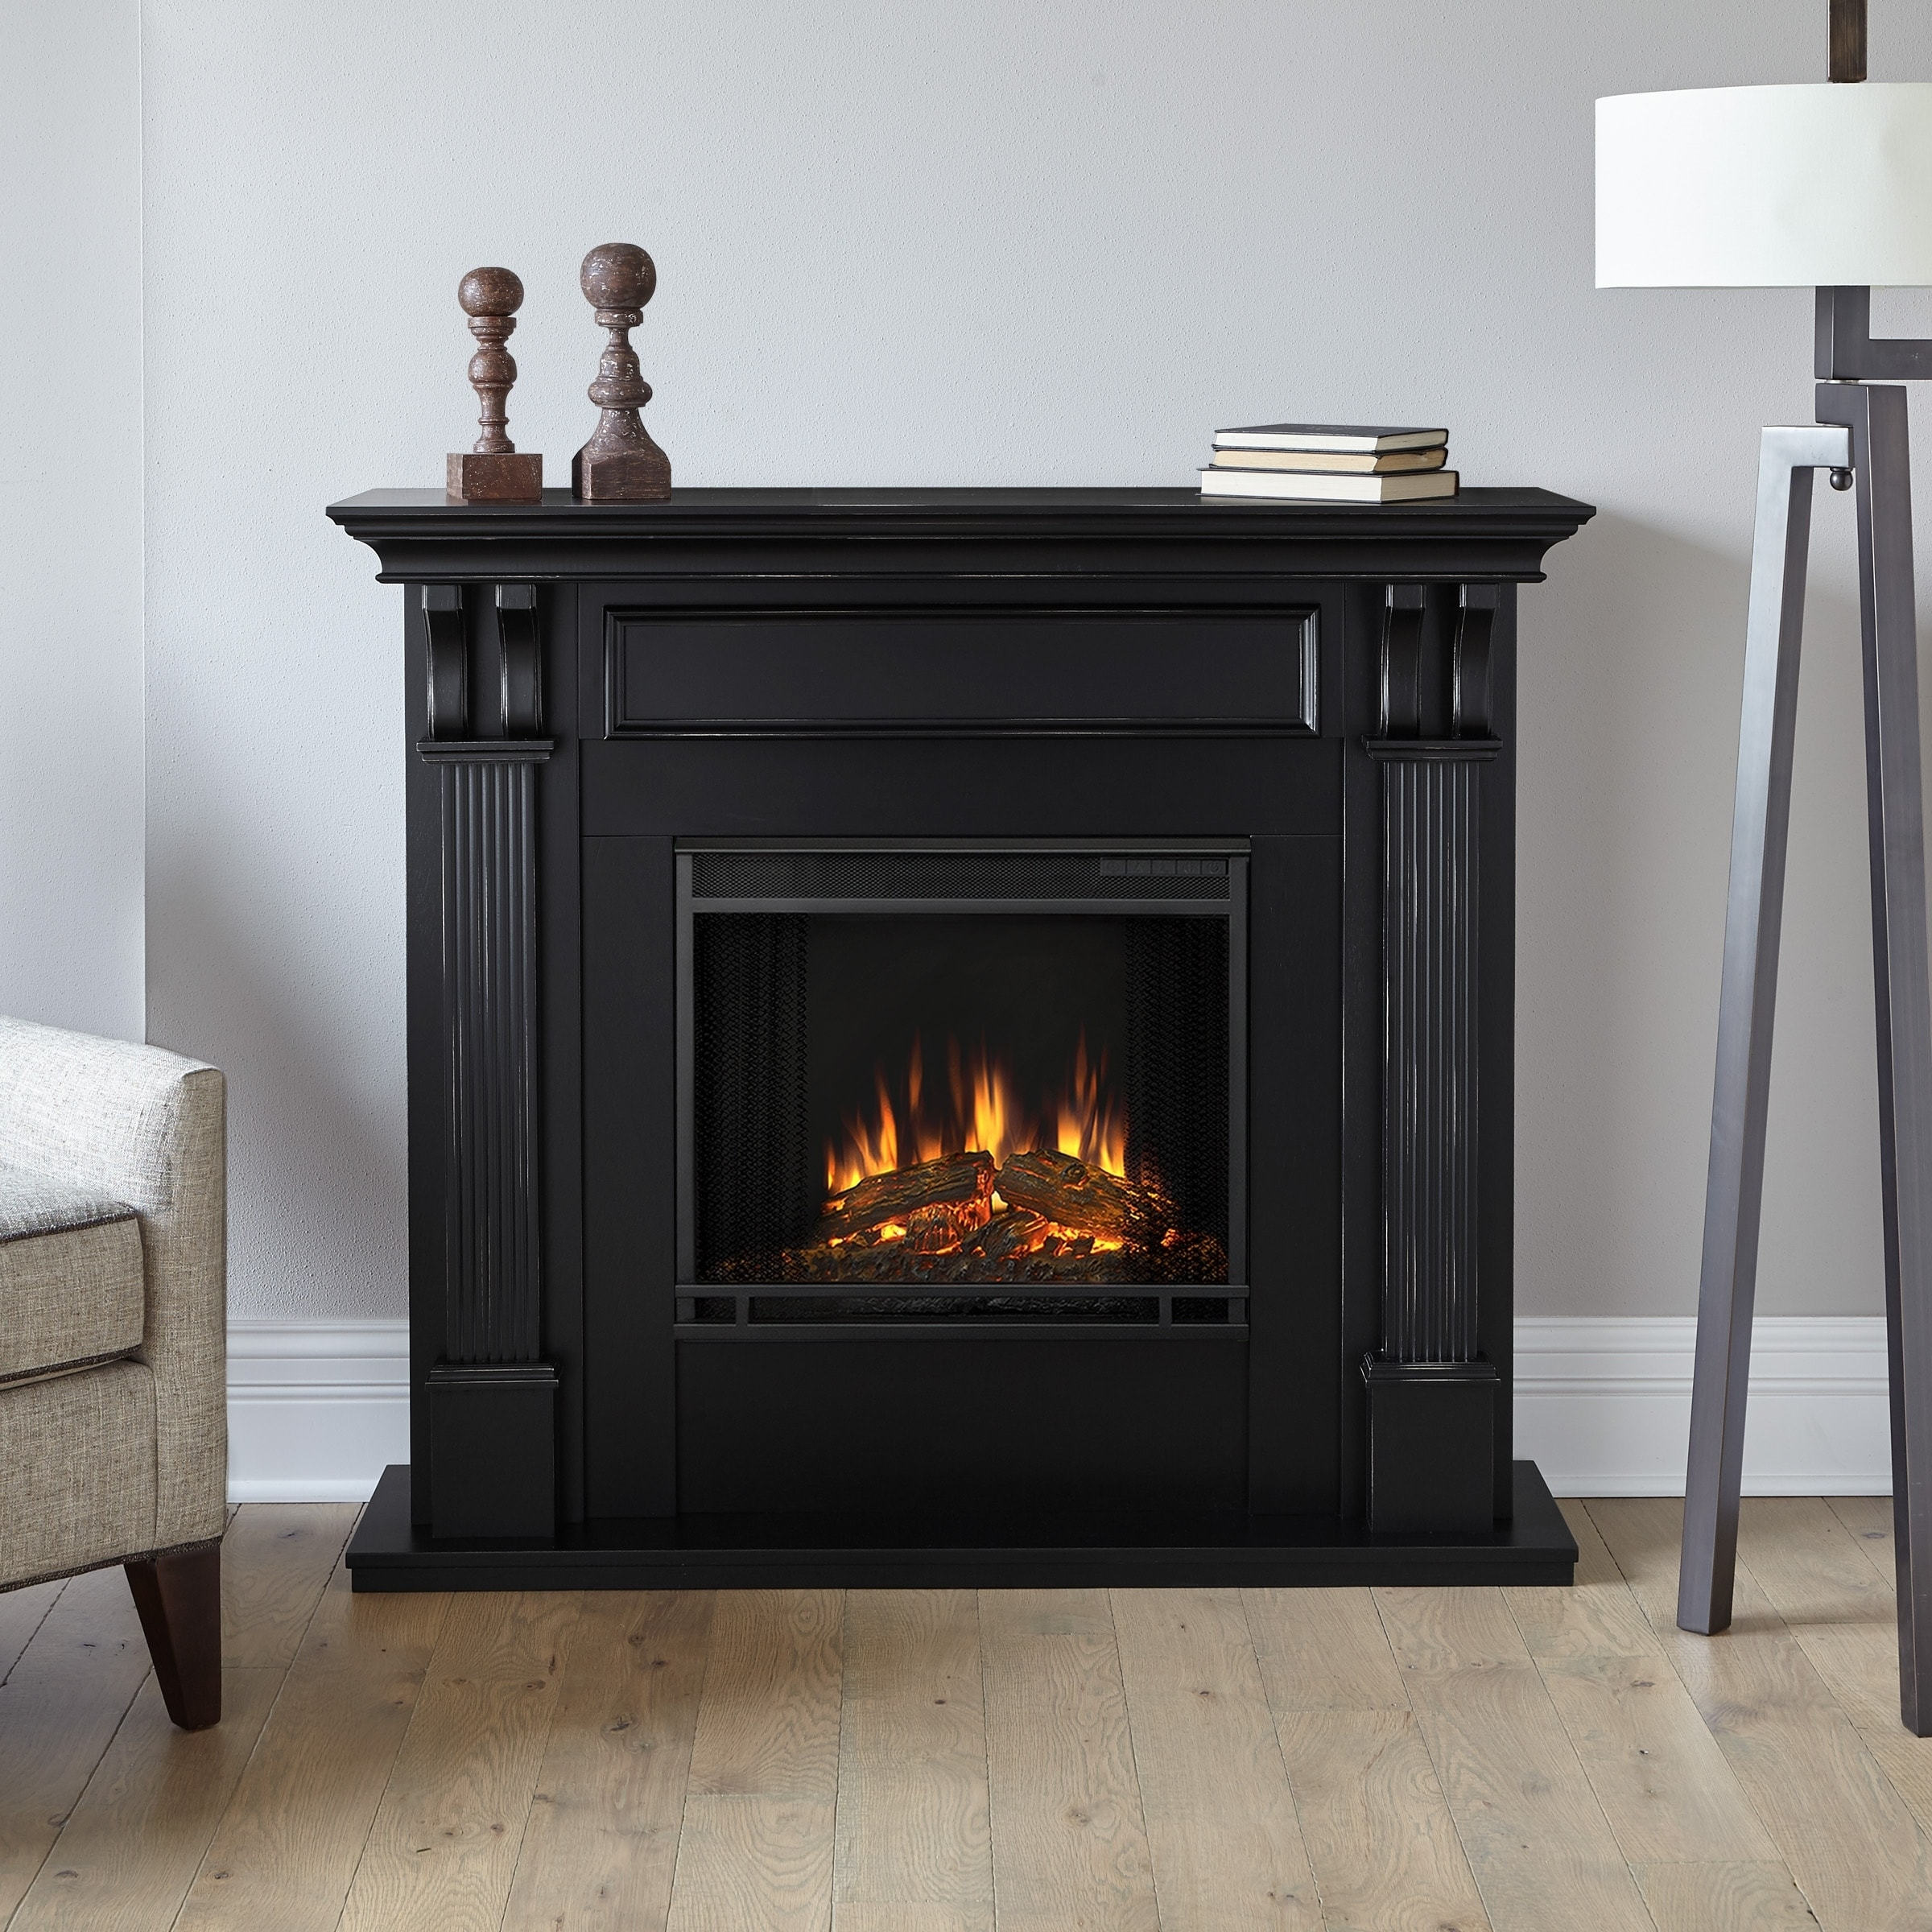 Harlan Grand Electric Fireplace Luxury Rachel Mayles Maylesrachel On Pinterest